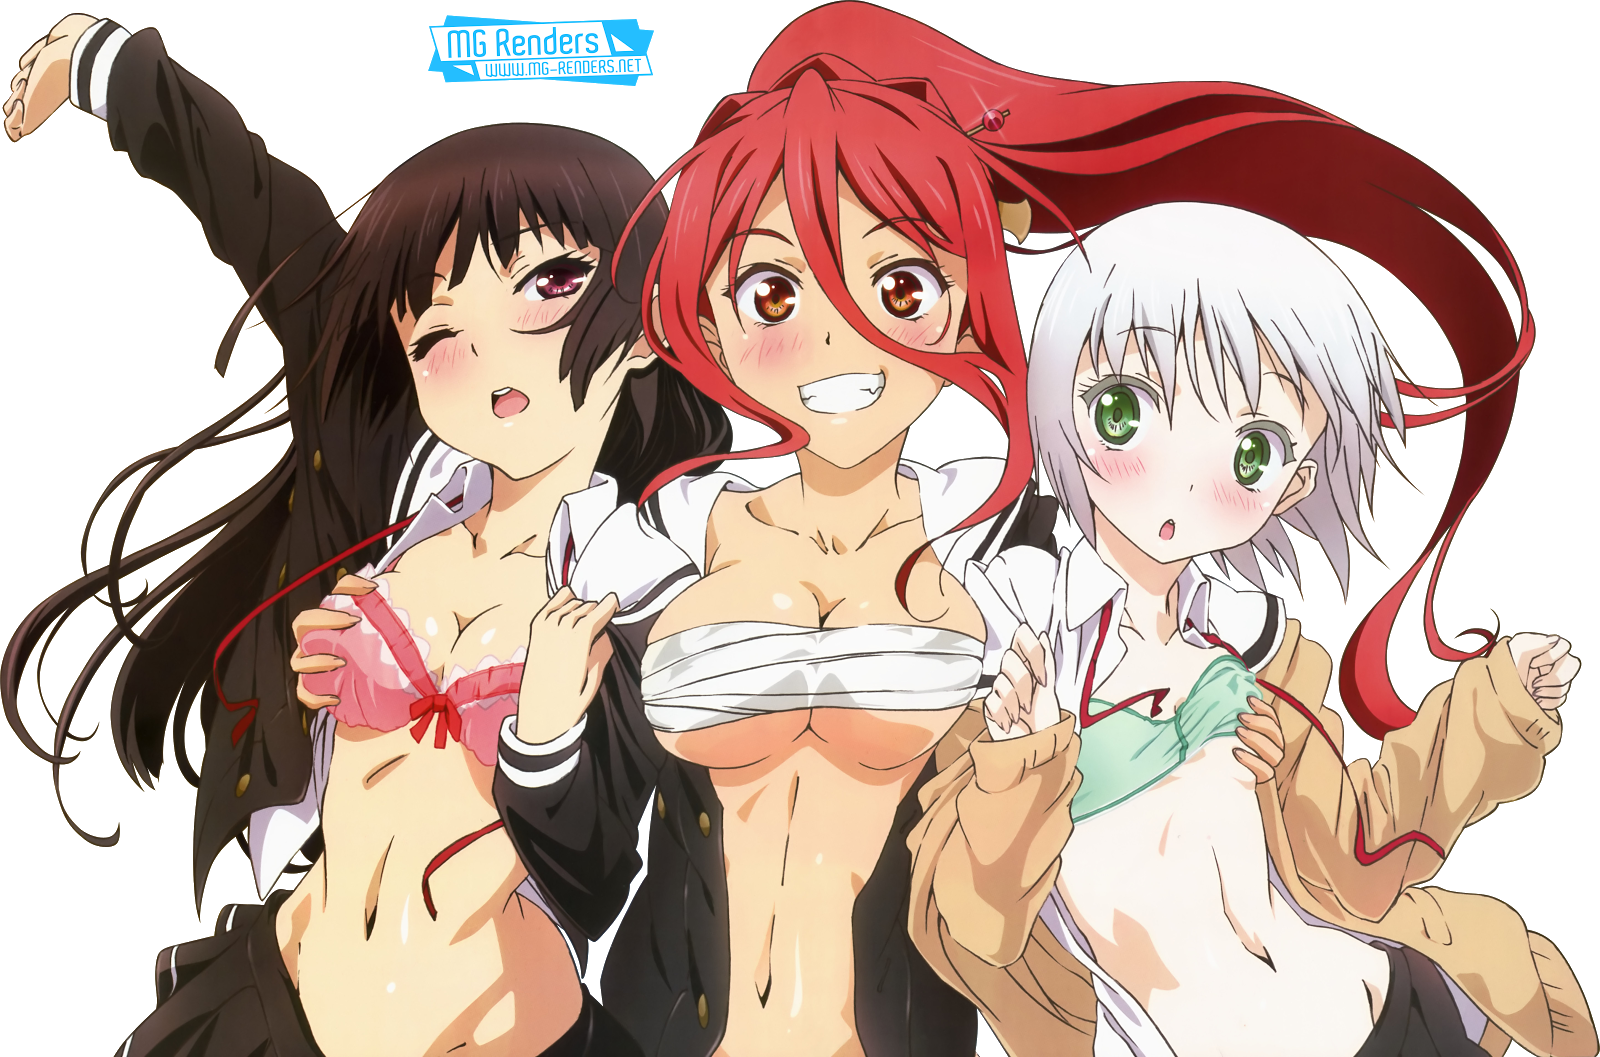 Tags: Anime, Render,  Himenokouji Akiko,  Nikaido Arashi,  Onii-chan dakedo Ai sae Areba Kankei nai yo ne,  Sawatari Haruomi, PNG, Image, Picture